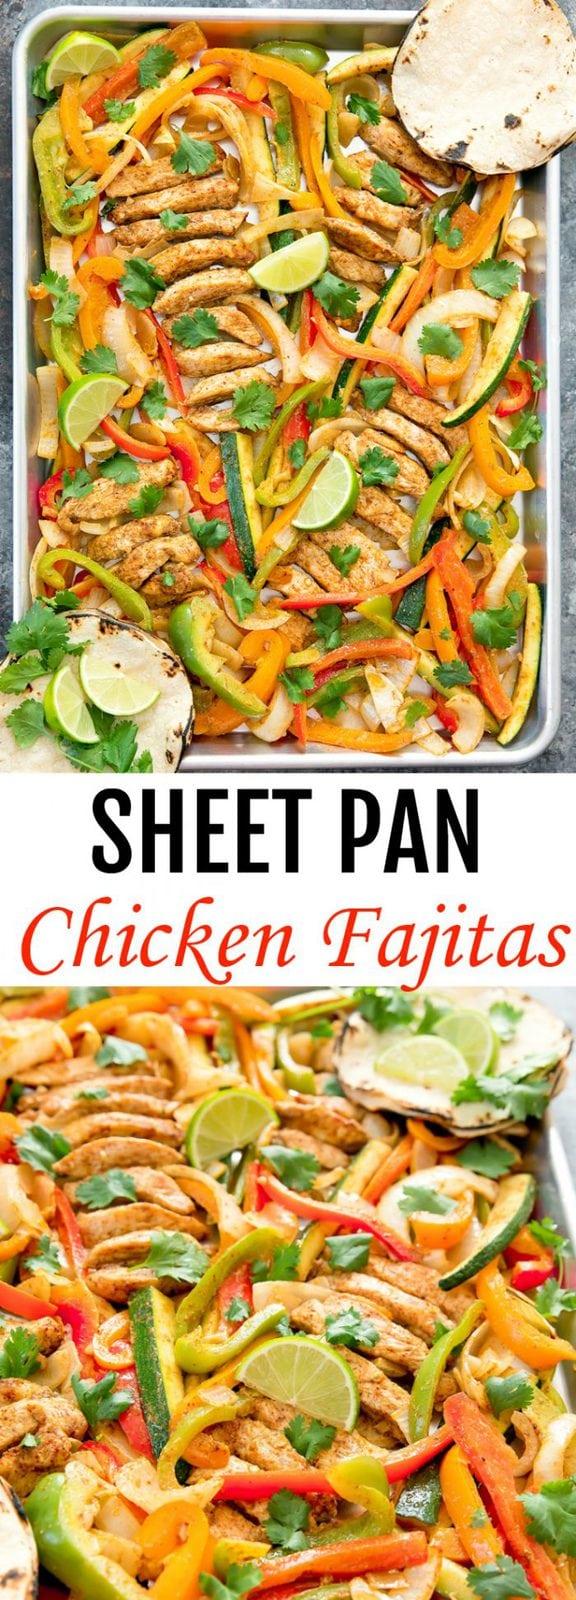 Sheet Pan Chicken Fajitas - Kirbie's Cravings